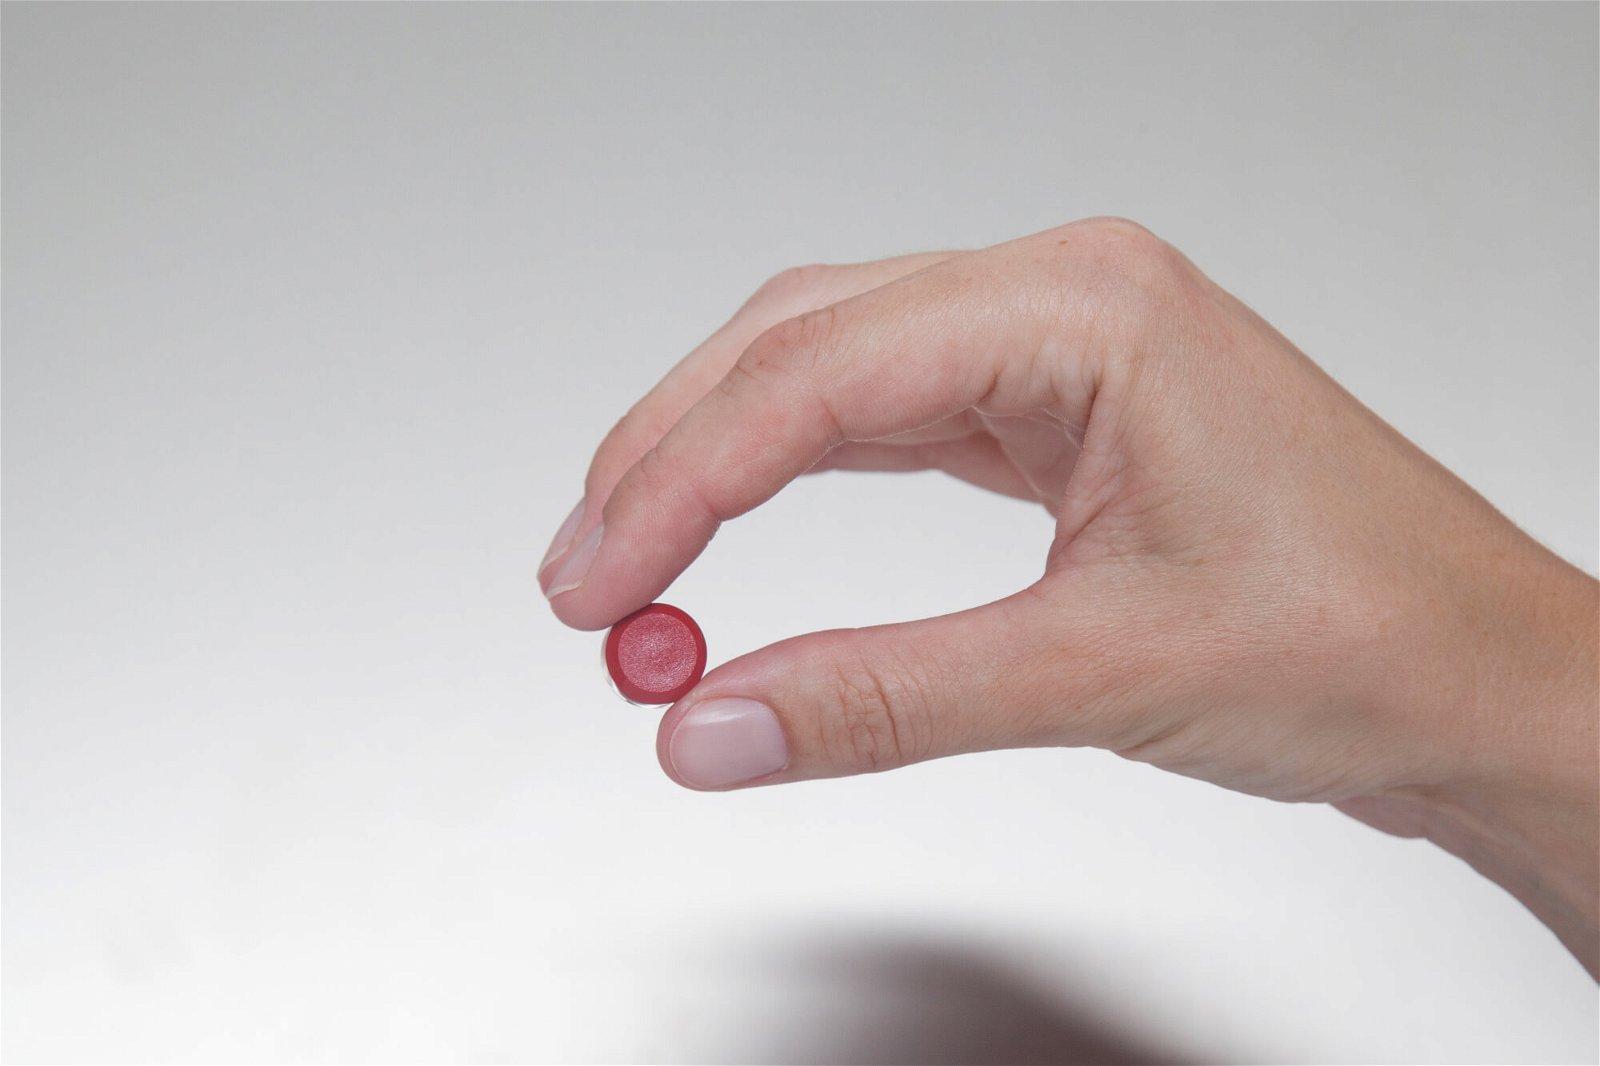 Facetterand-Magnet MAULpro Ø 15 mm, 0,17 kg, 20 St./Set, rot